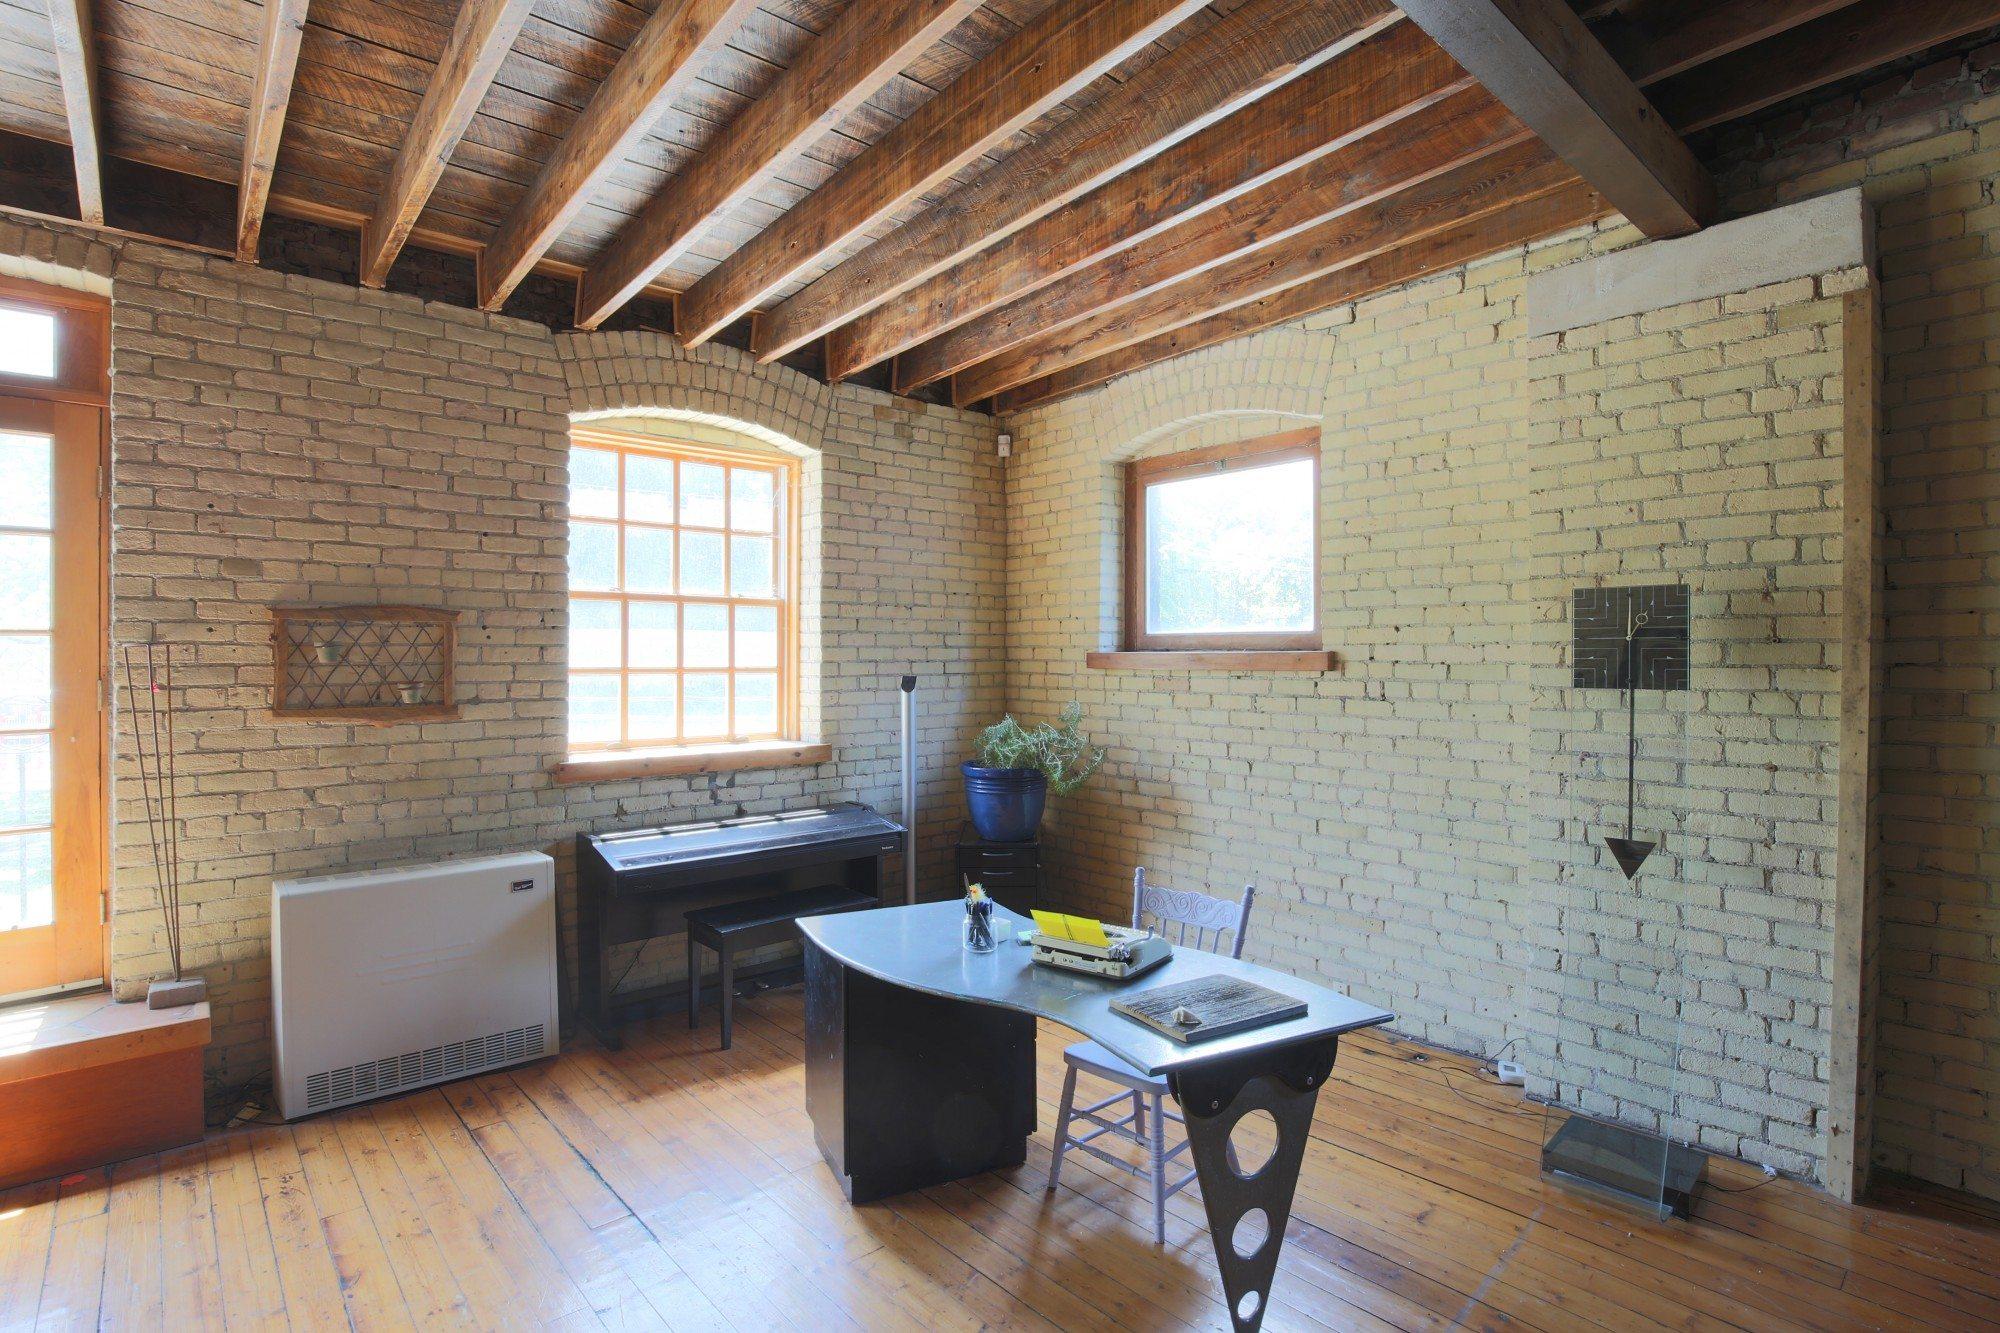 toronto-house-for-sale-154-shuter-street-10